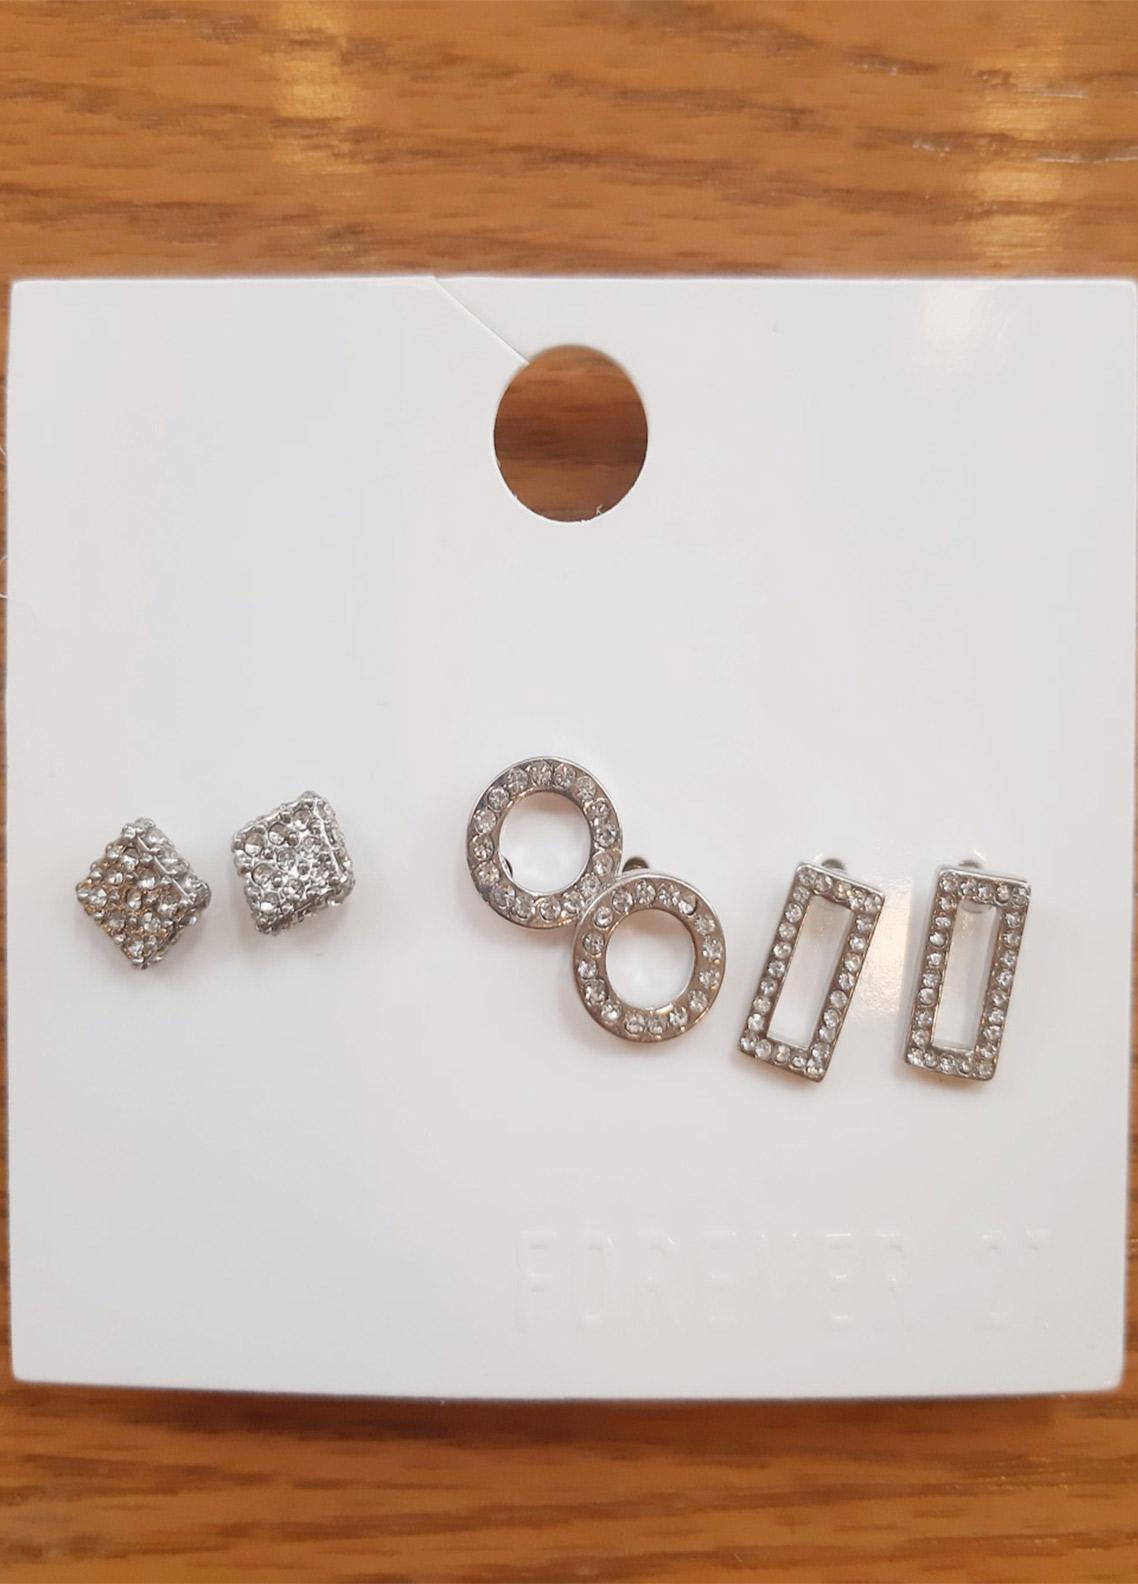 Forever21 Rhinestone Stud Earring Set  - Ladies Jewellery